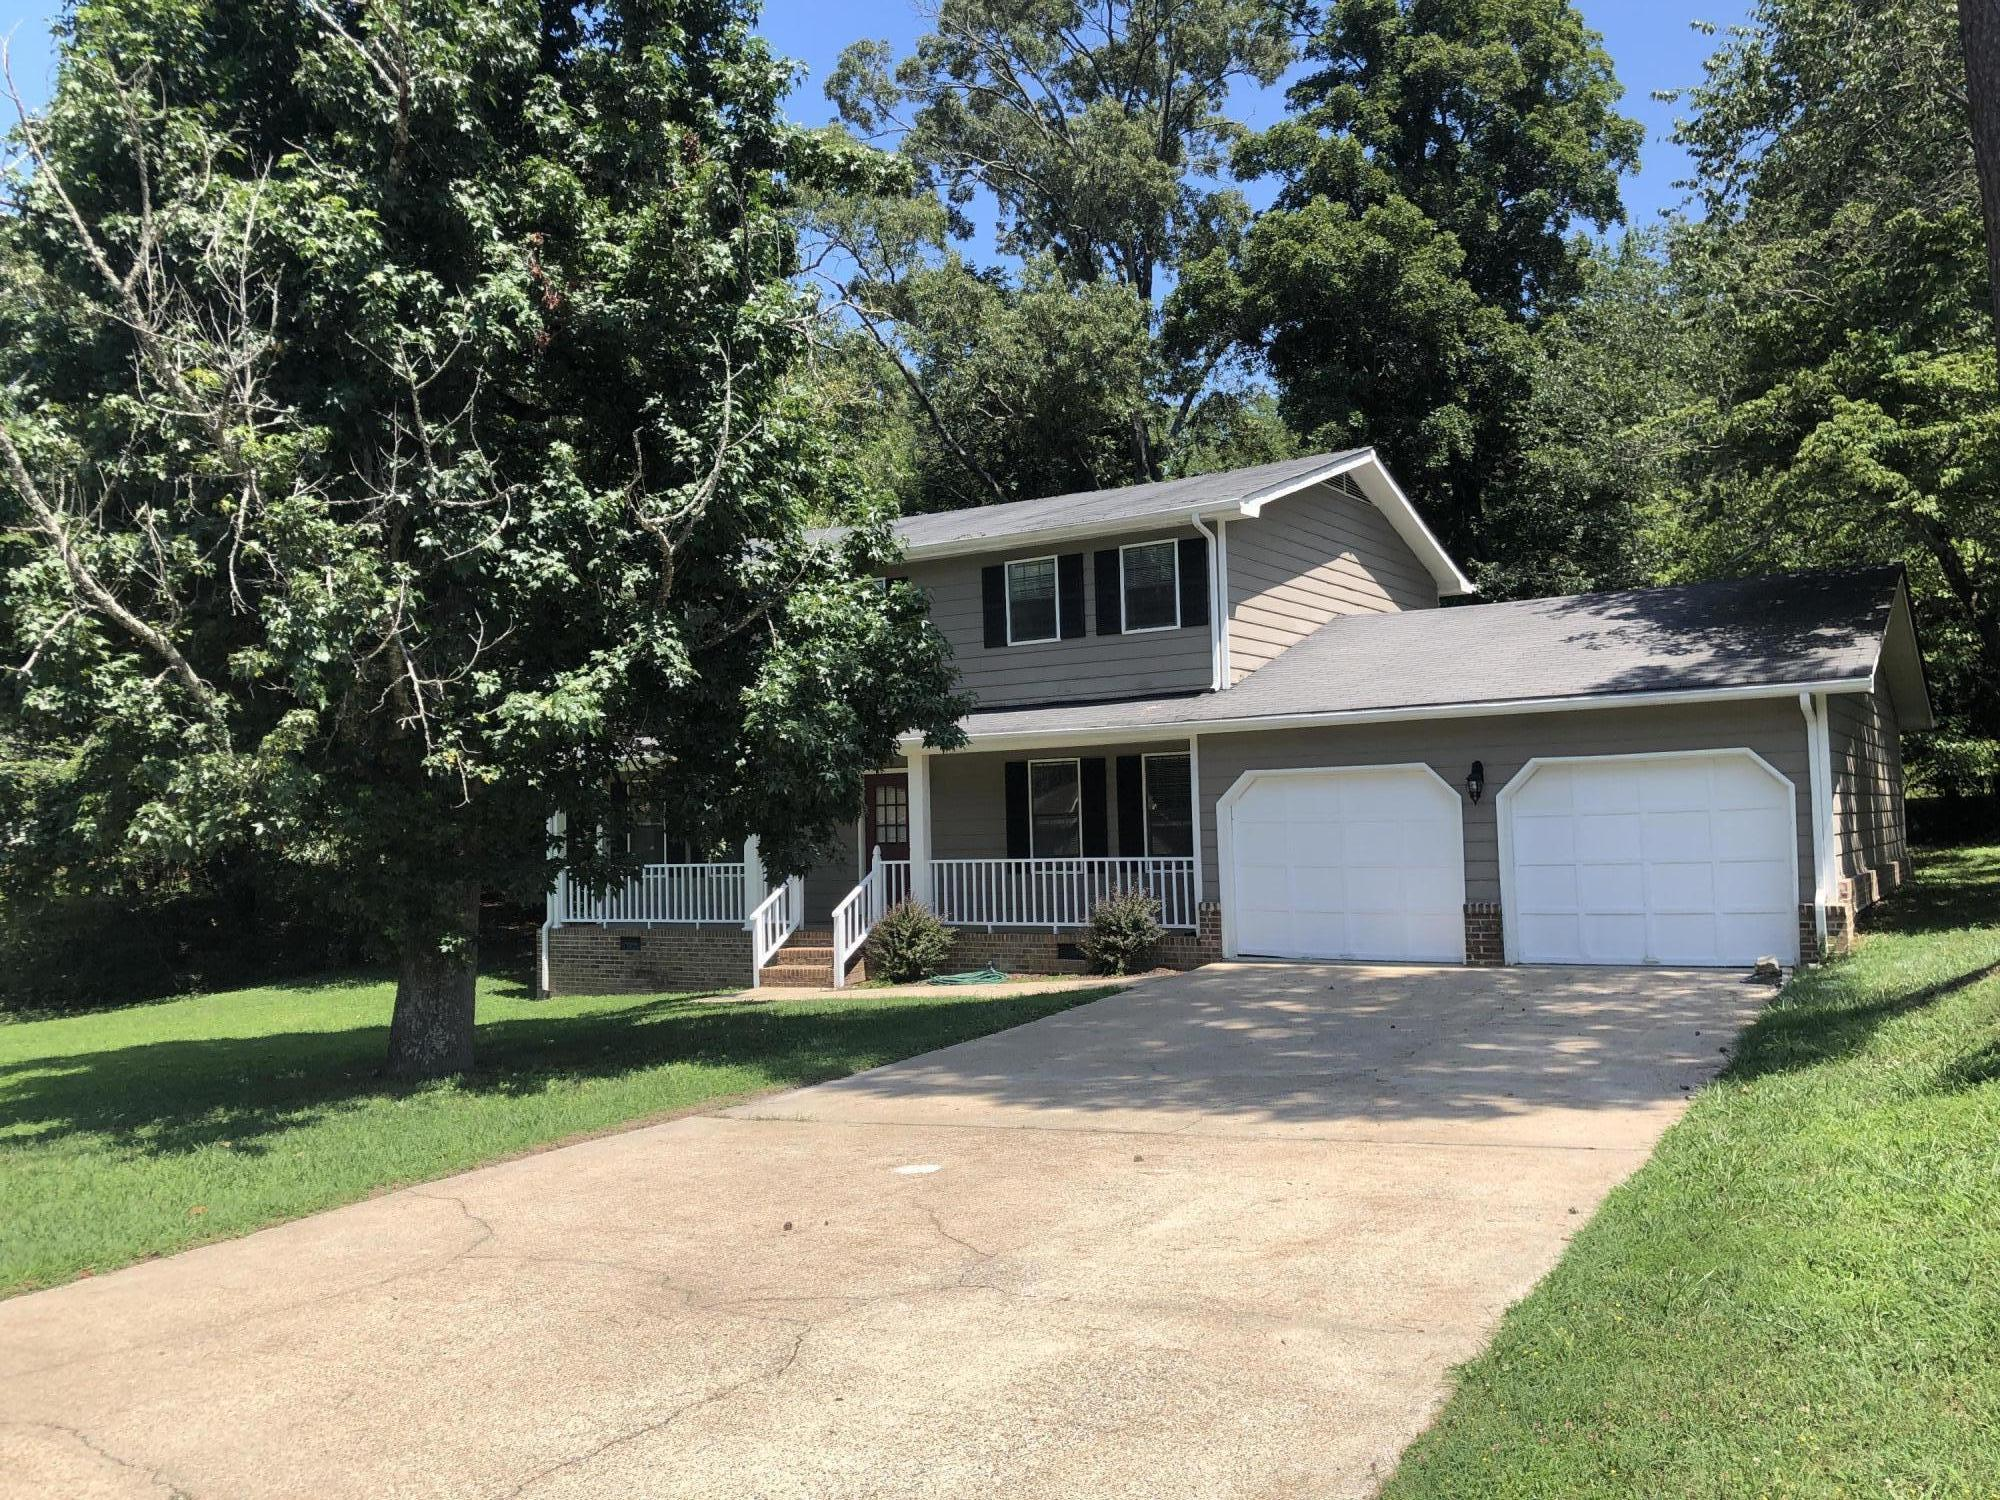 9209  Berkshire  Cir, Chattanooga, Tennessee